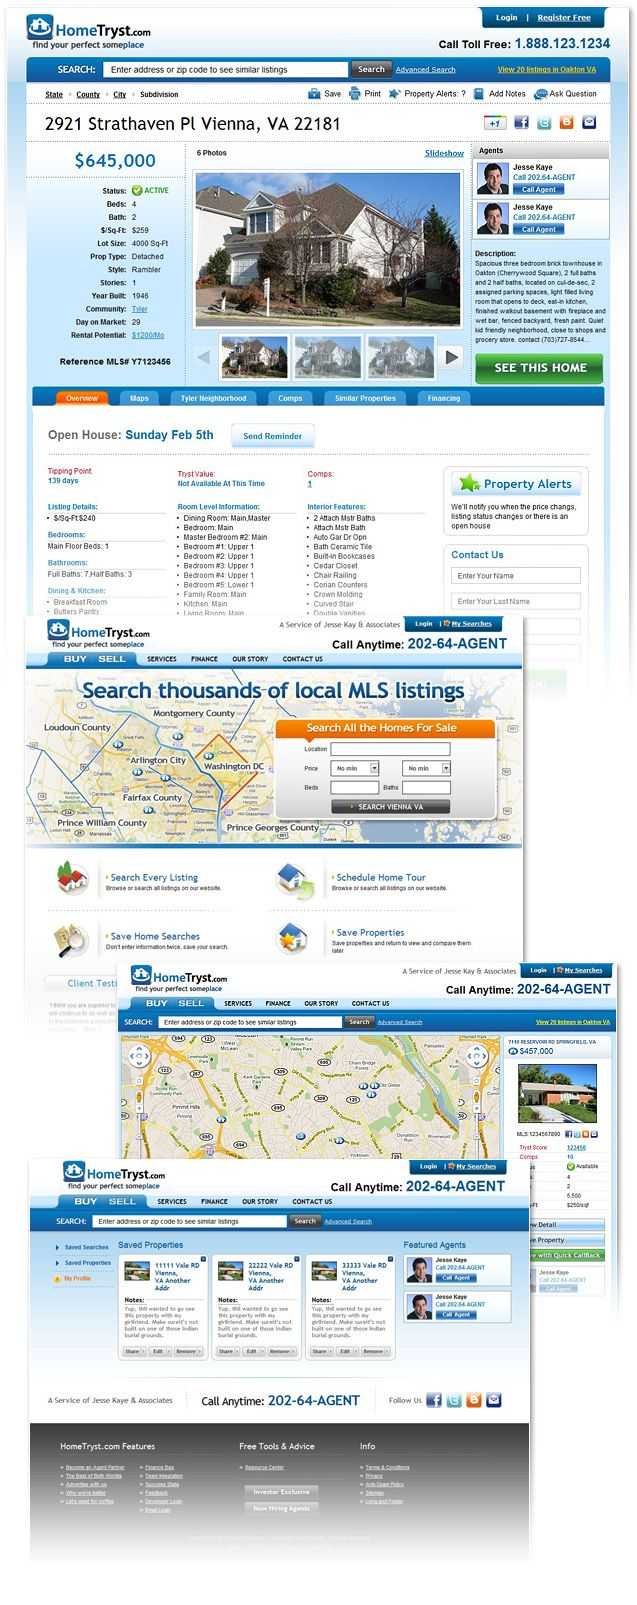 Real Estate Broker Website Design In Dc Virginia And Maryland Financial Website Web Design Firm Custom Website Design